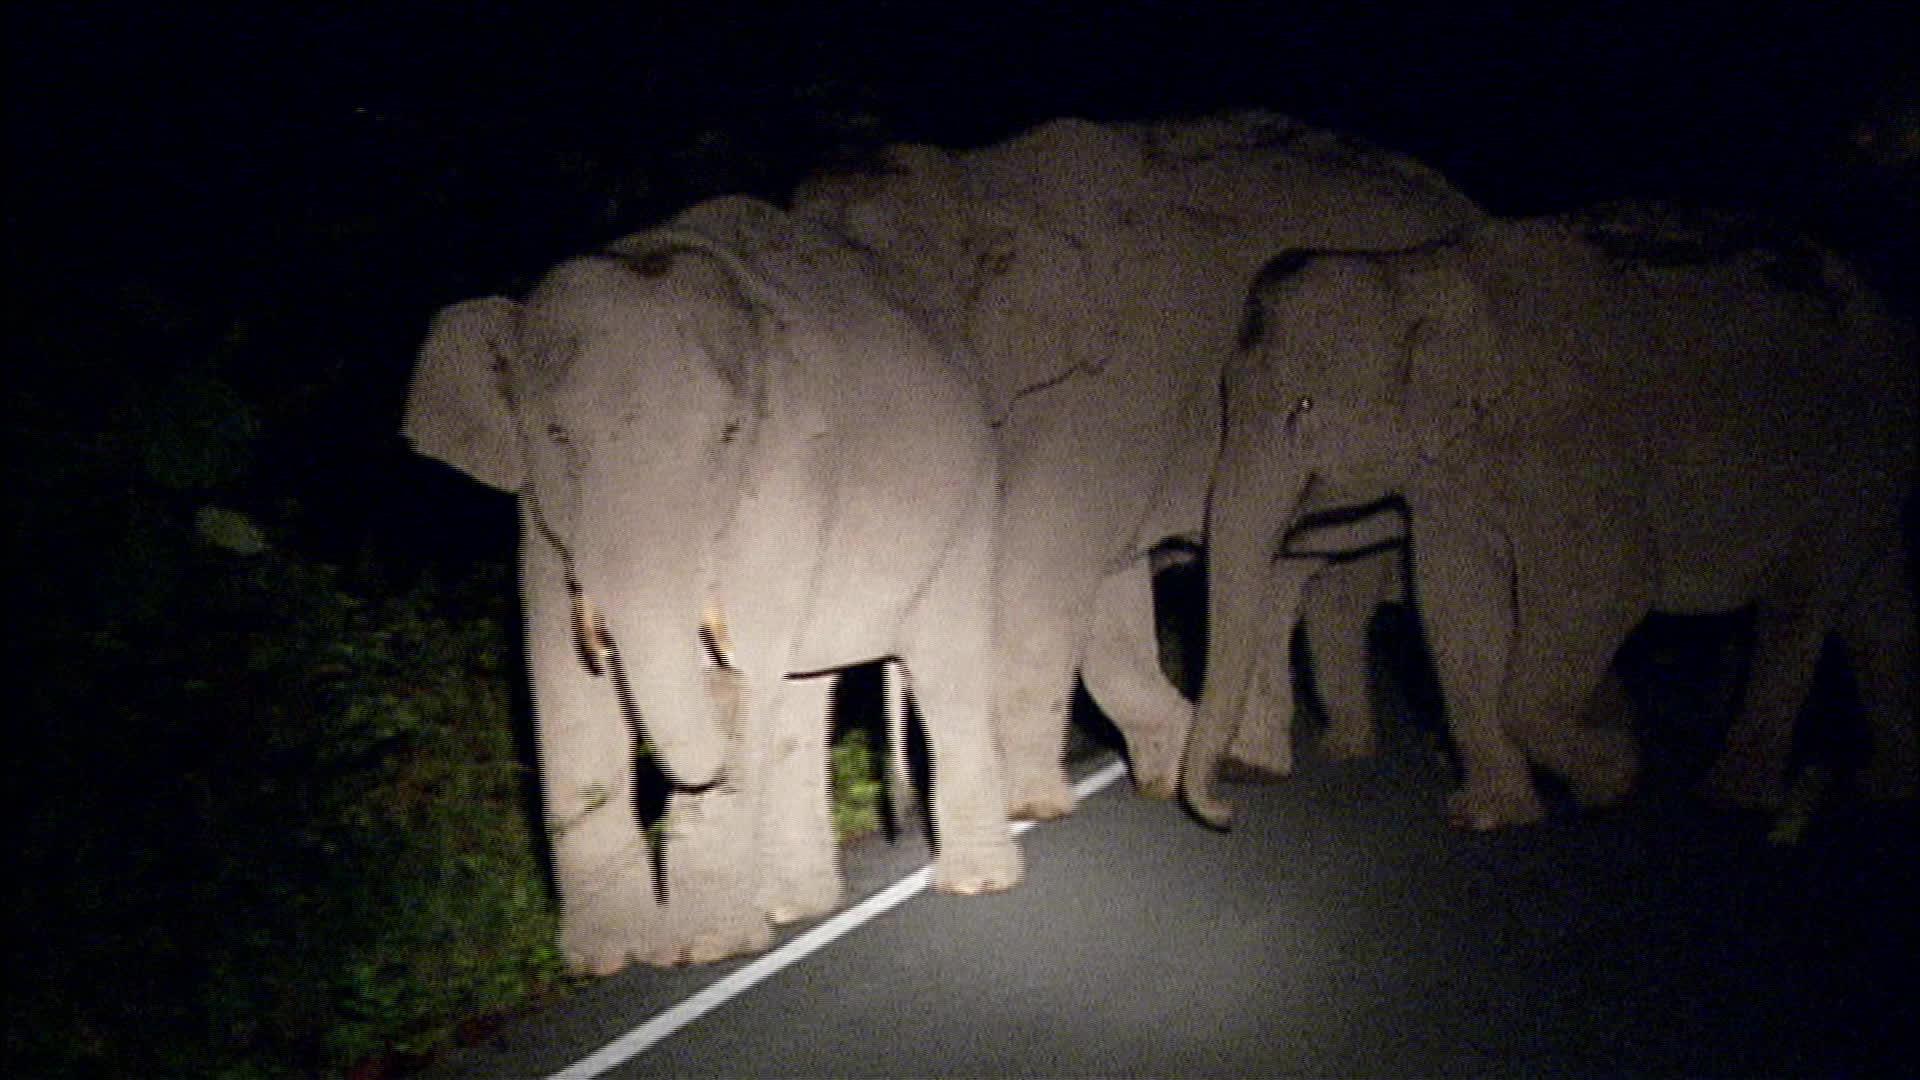 Les éléphants - Thaïlande